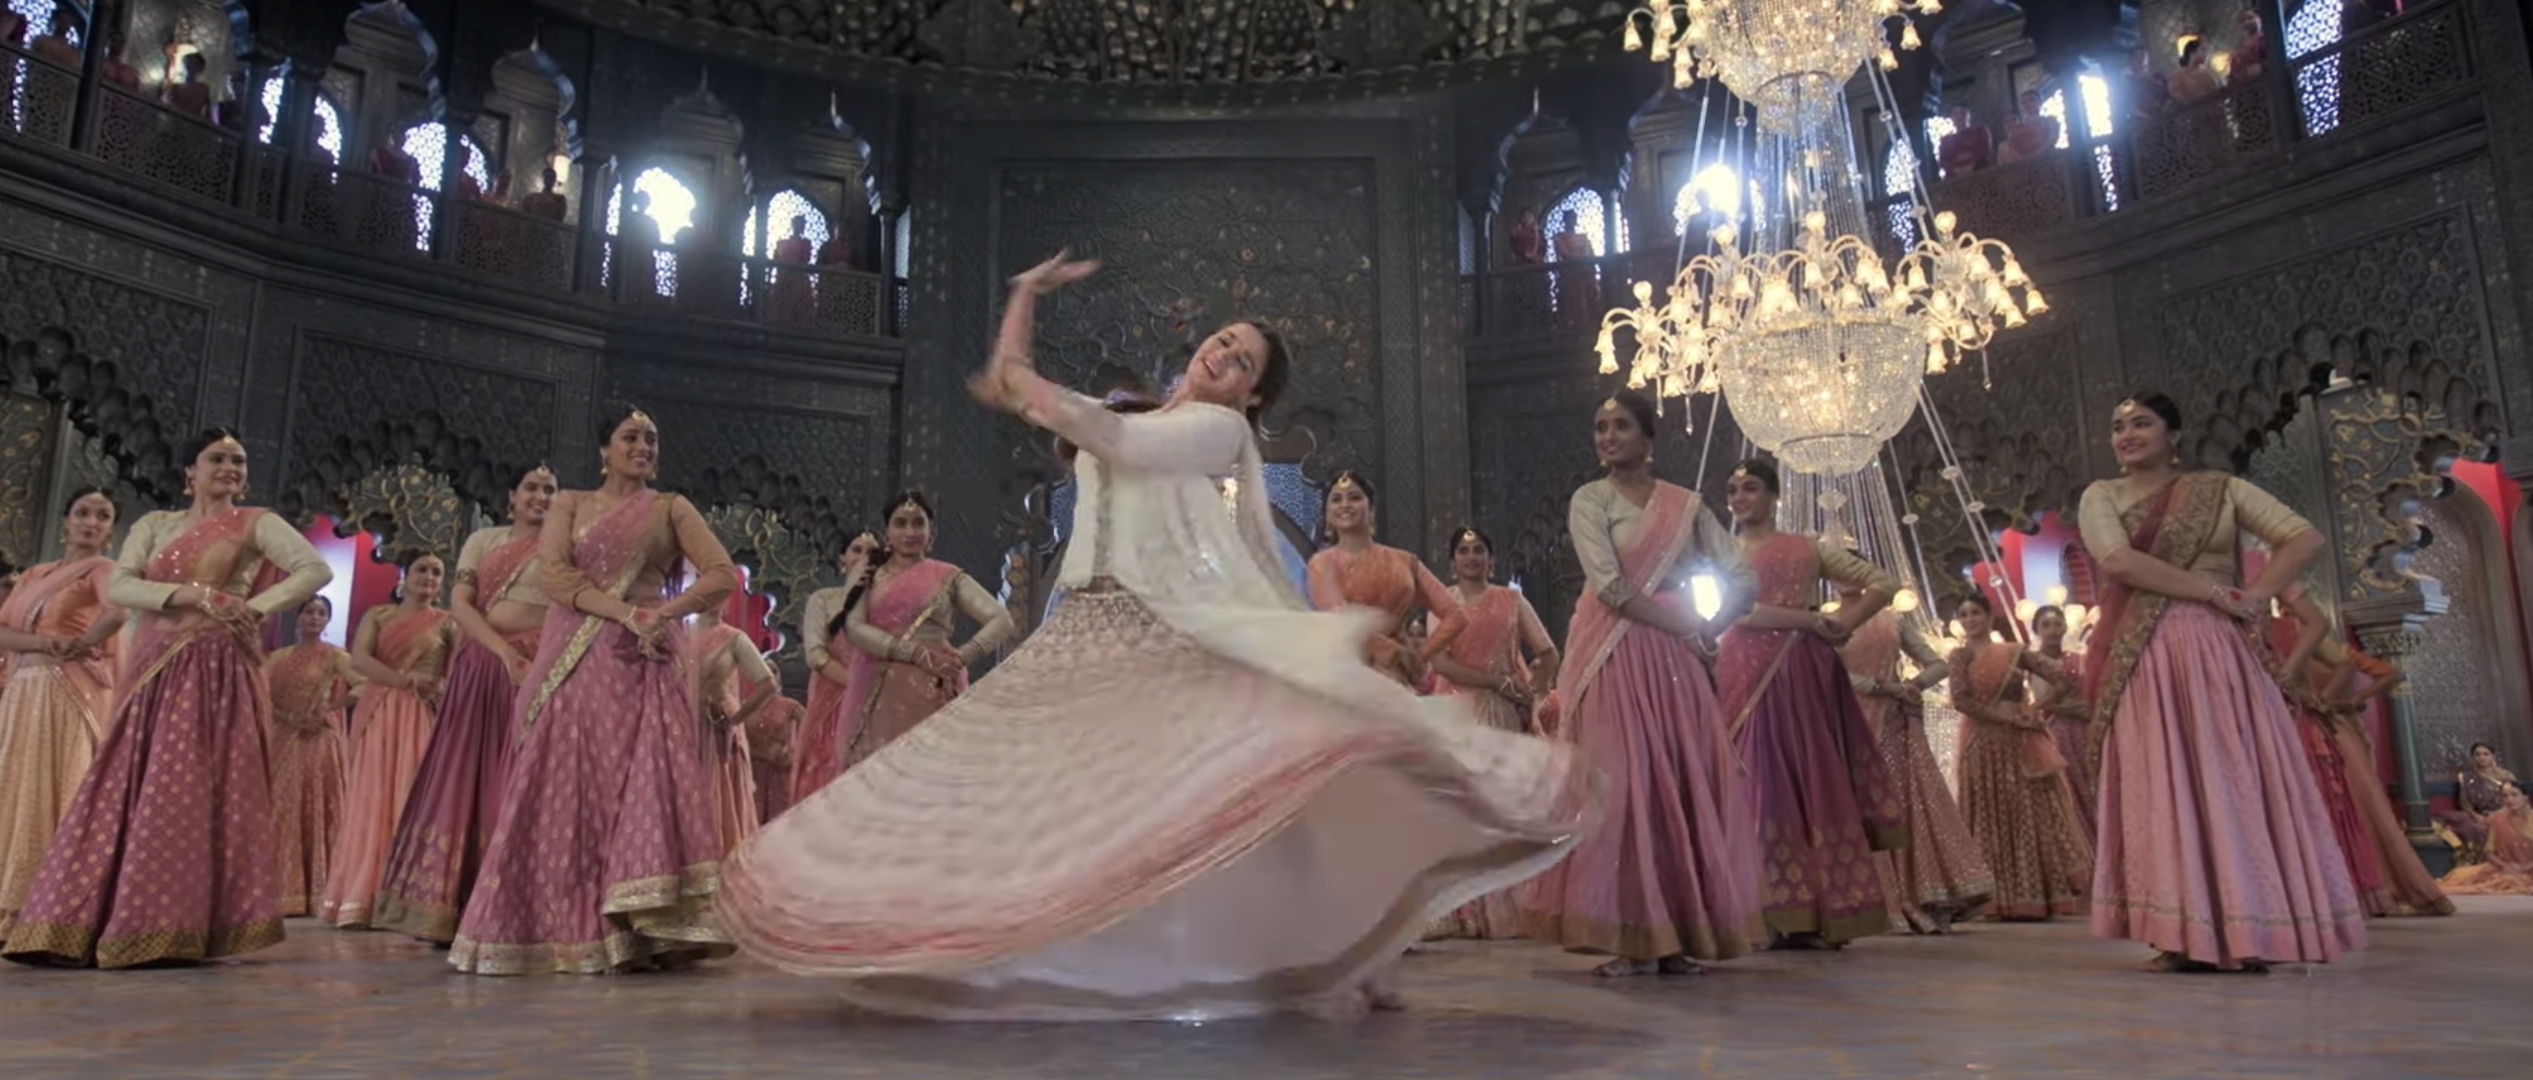 'Kalank' Song Review: 'Ghar More Pardesiya' Showcases Alia Bhatt's Dancing Chops